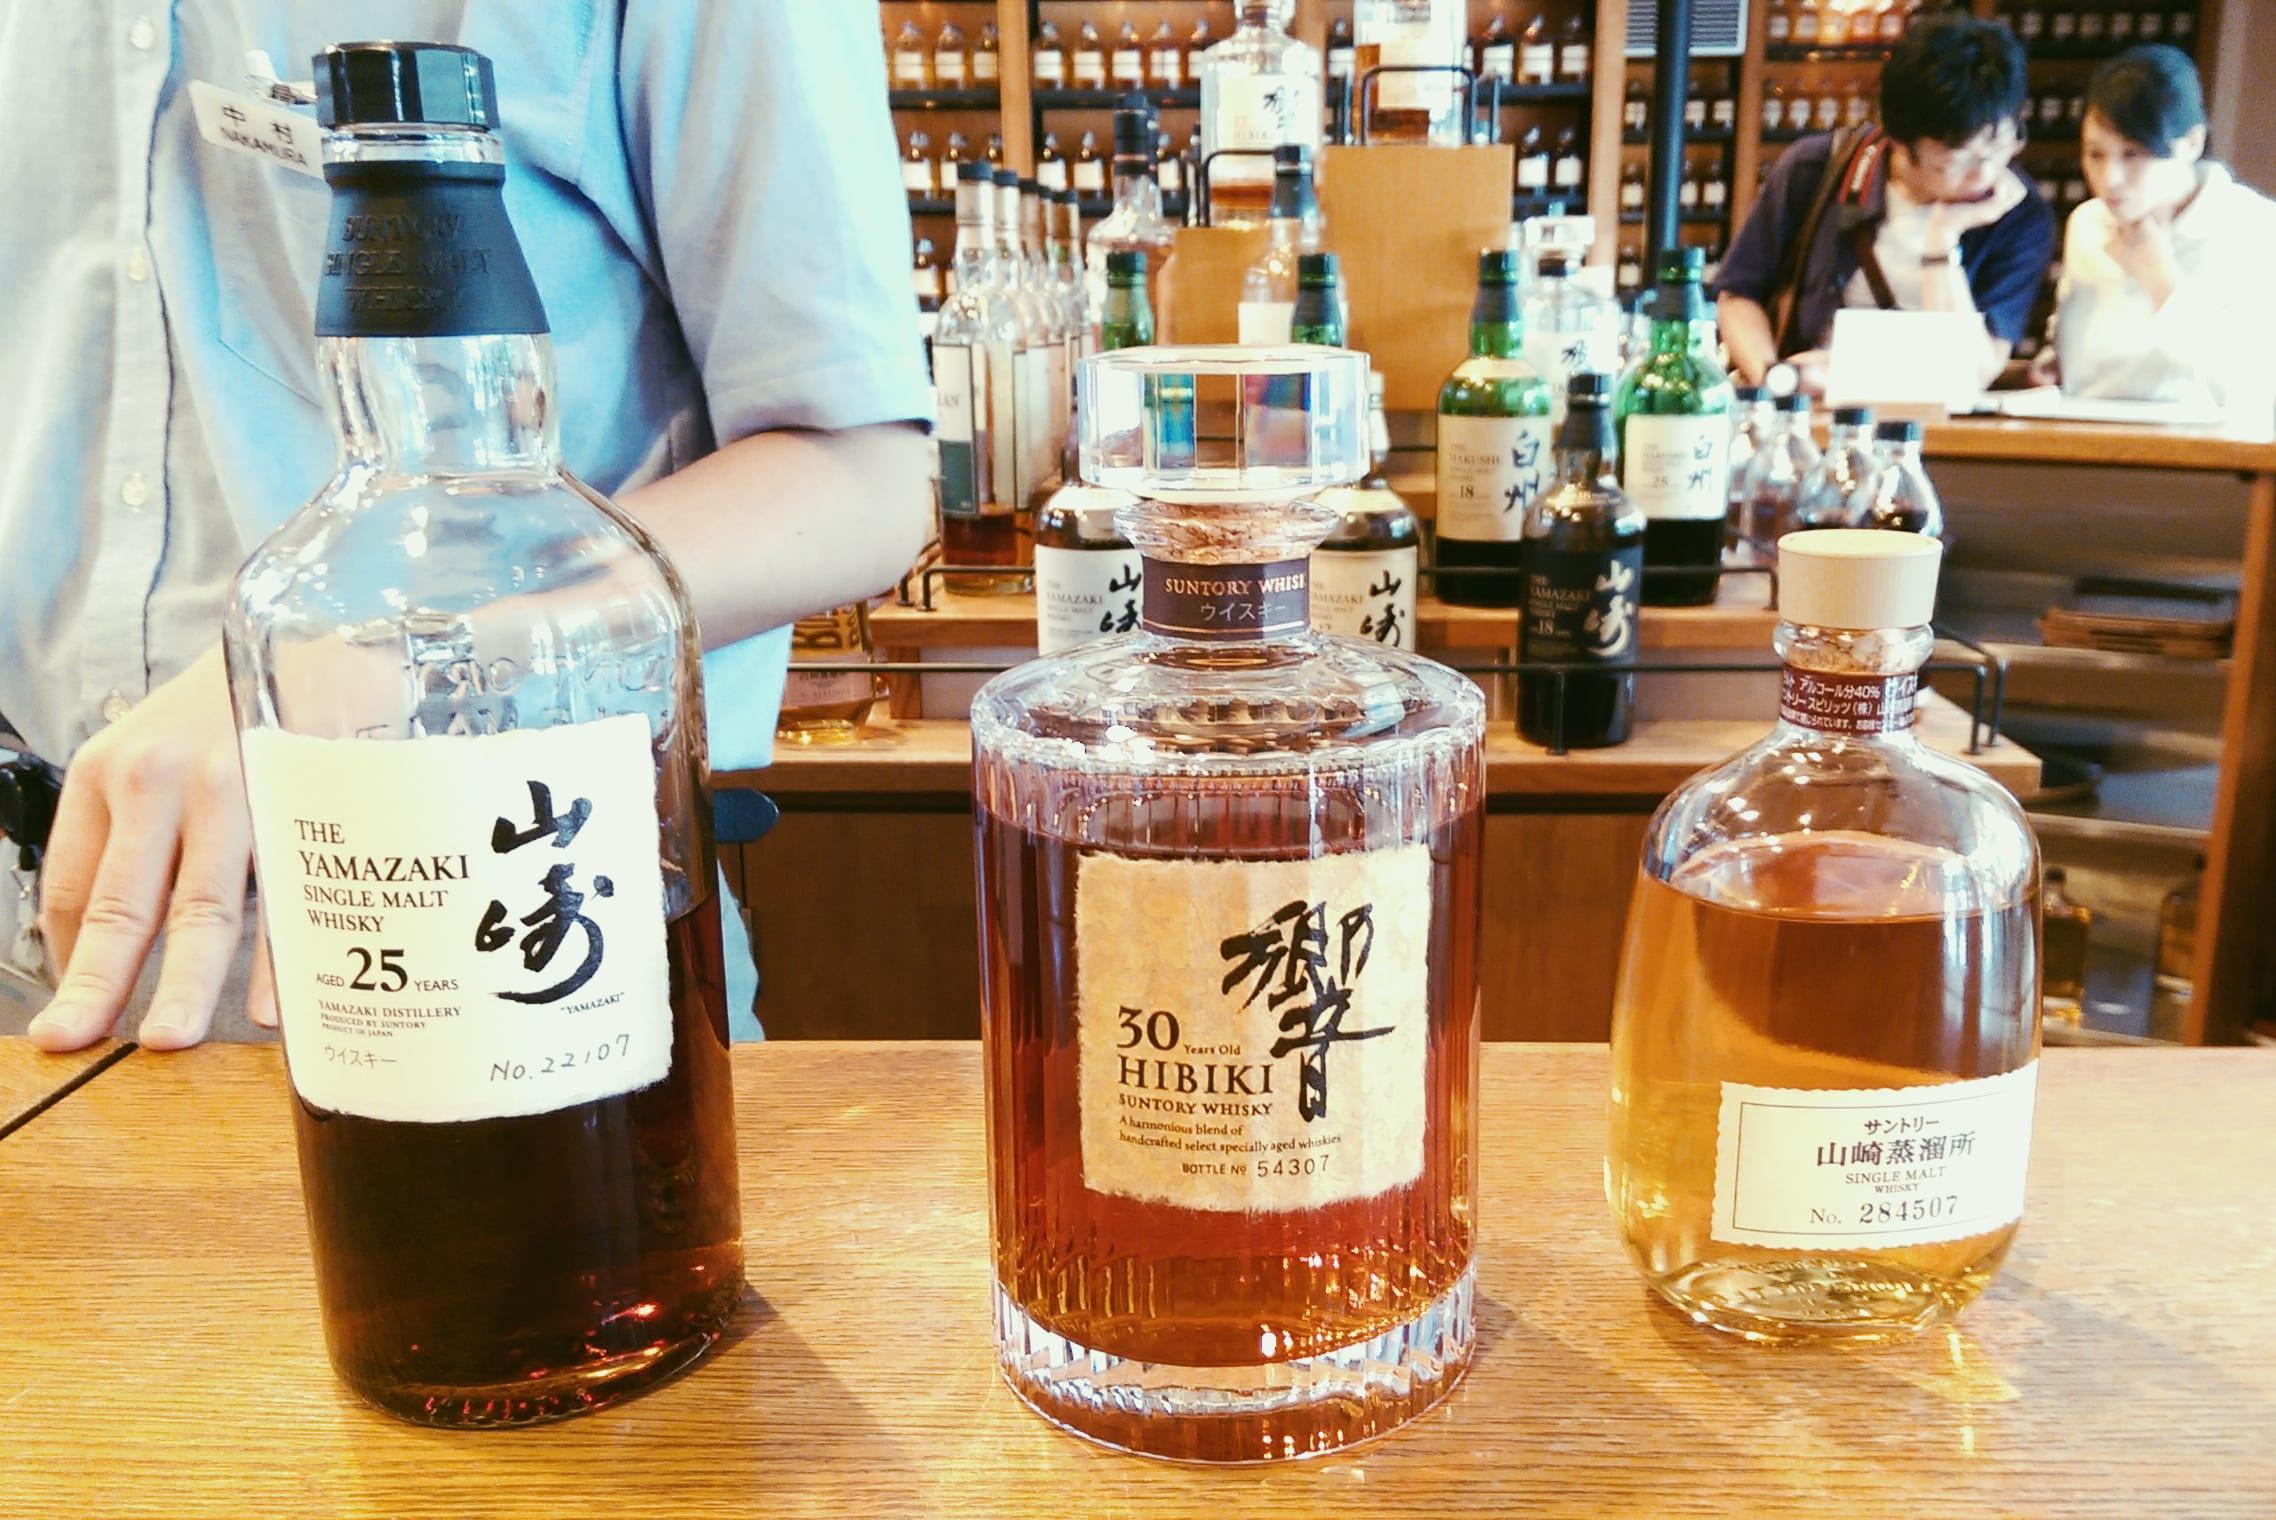 yamazaki whisky distillery tour